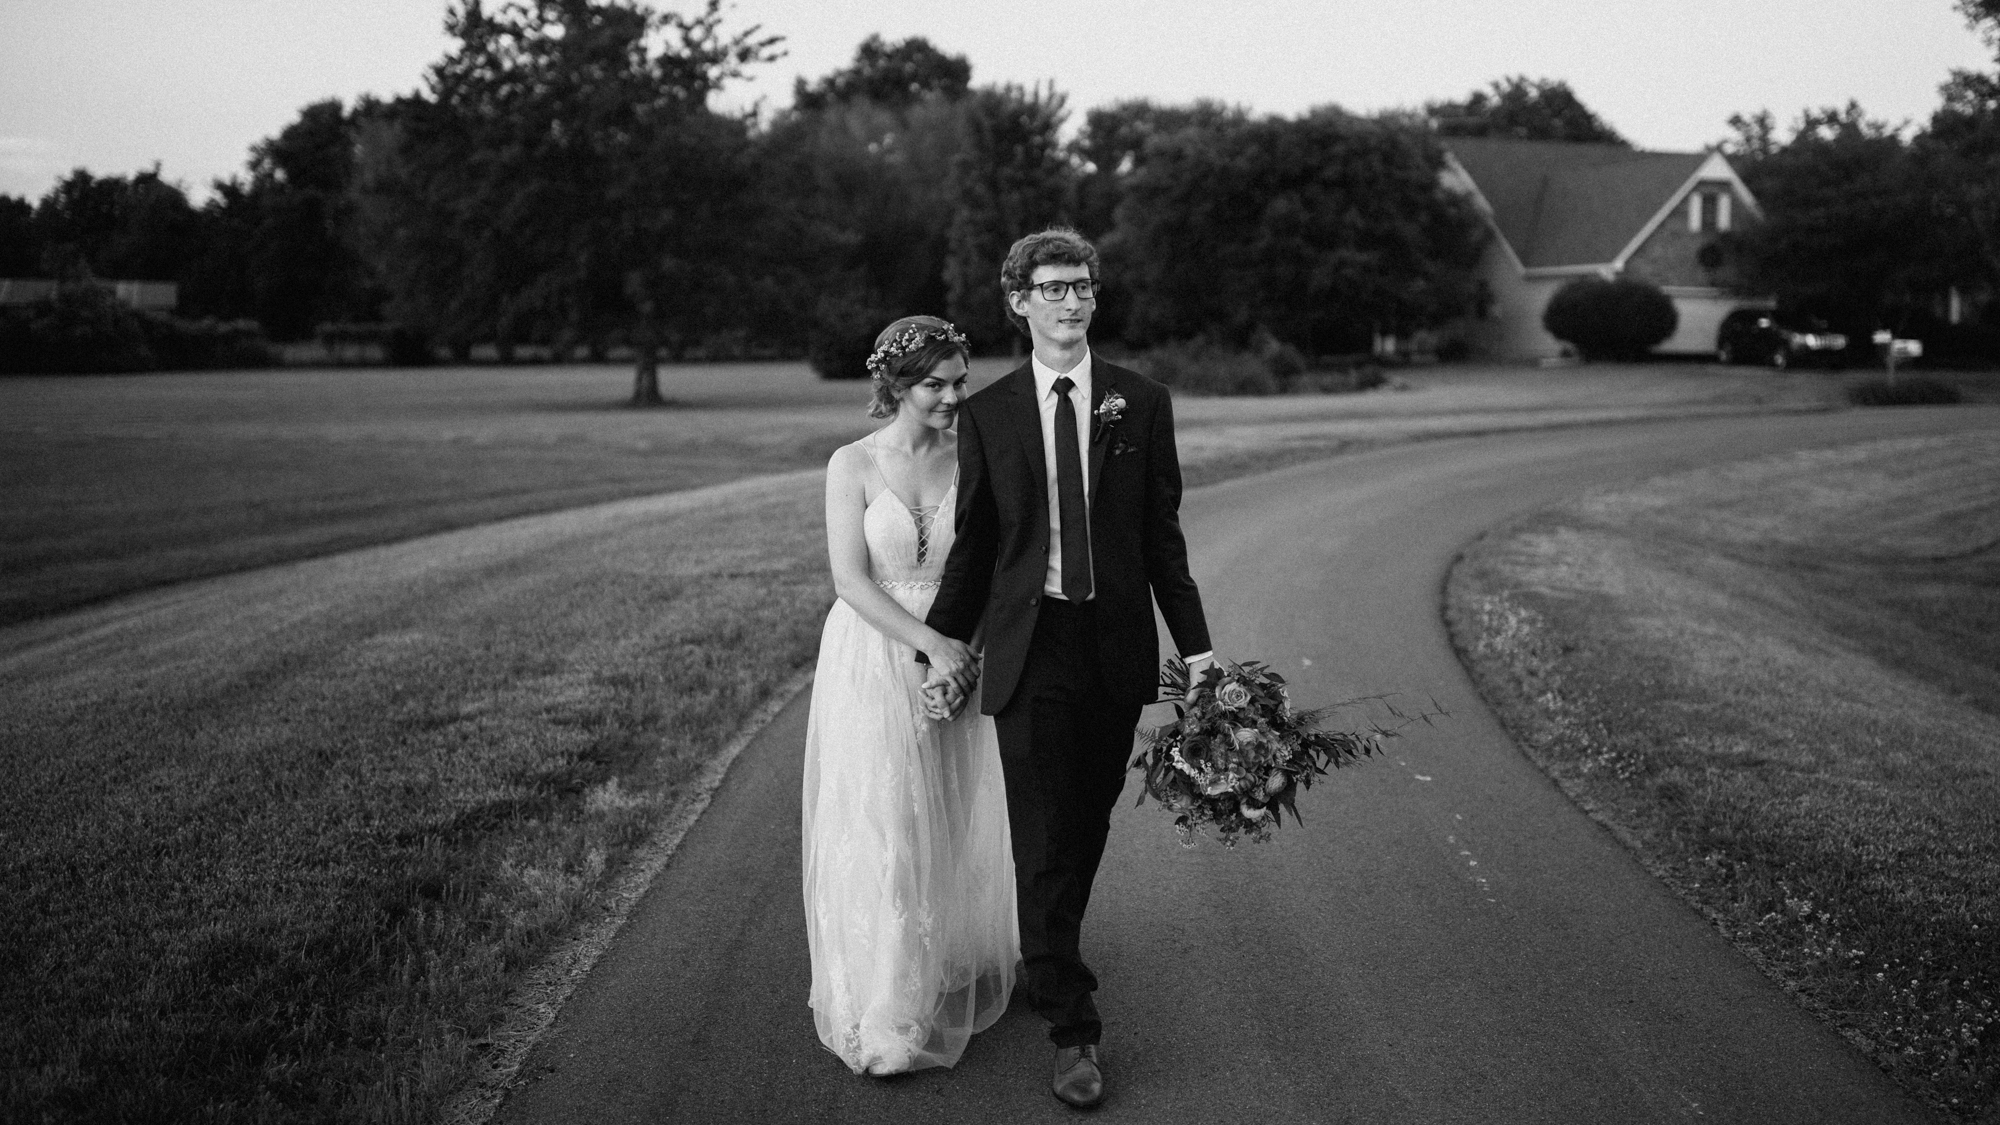 alec_vanderboom_kansas_city_mo_wedding_photos-0068.jpg